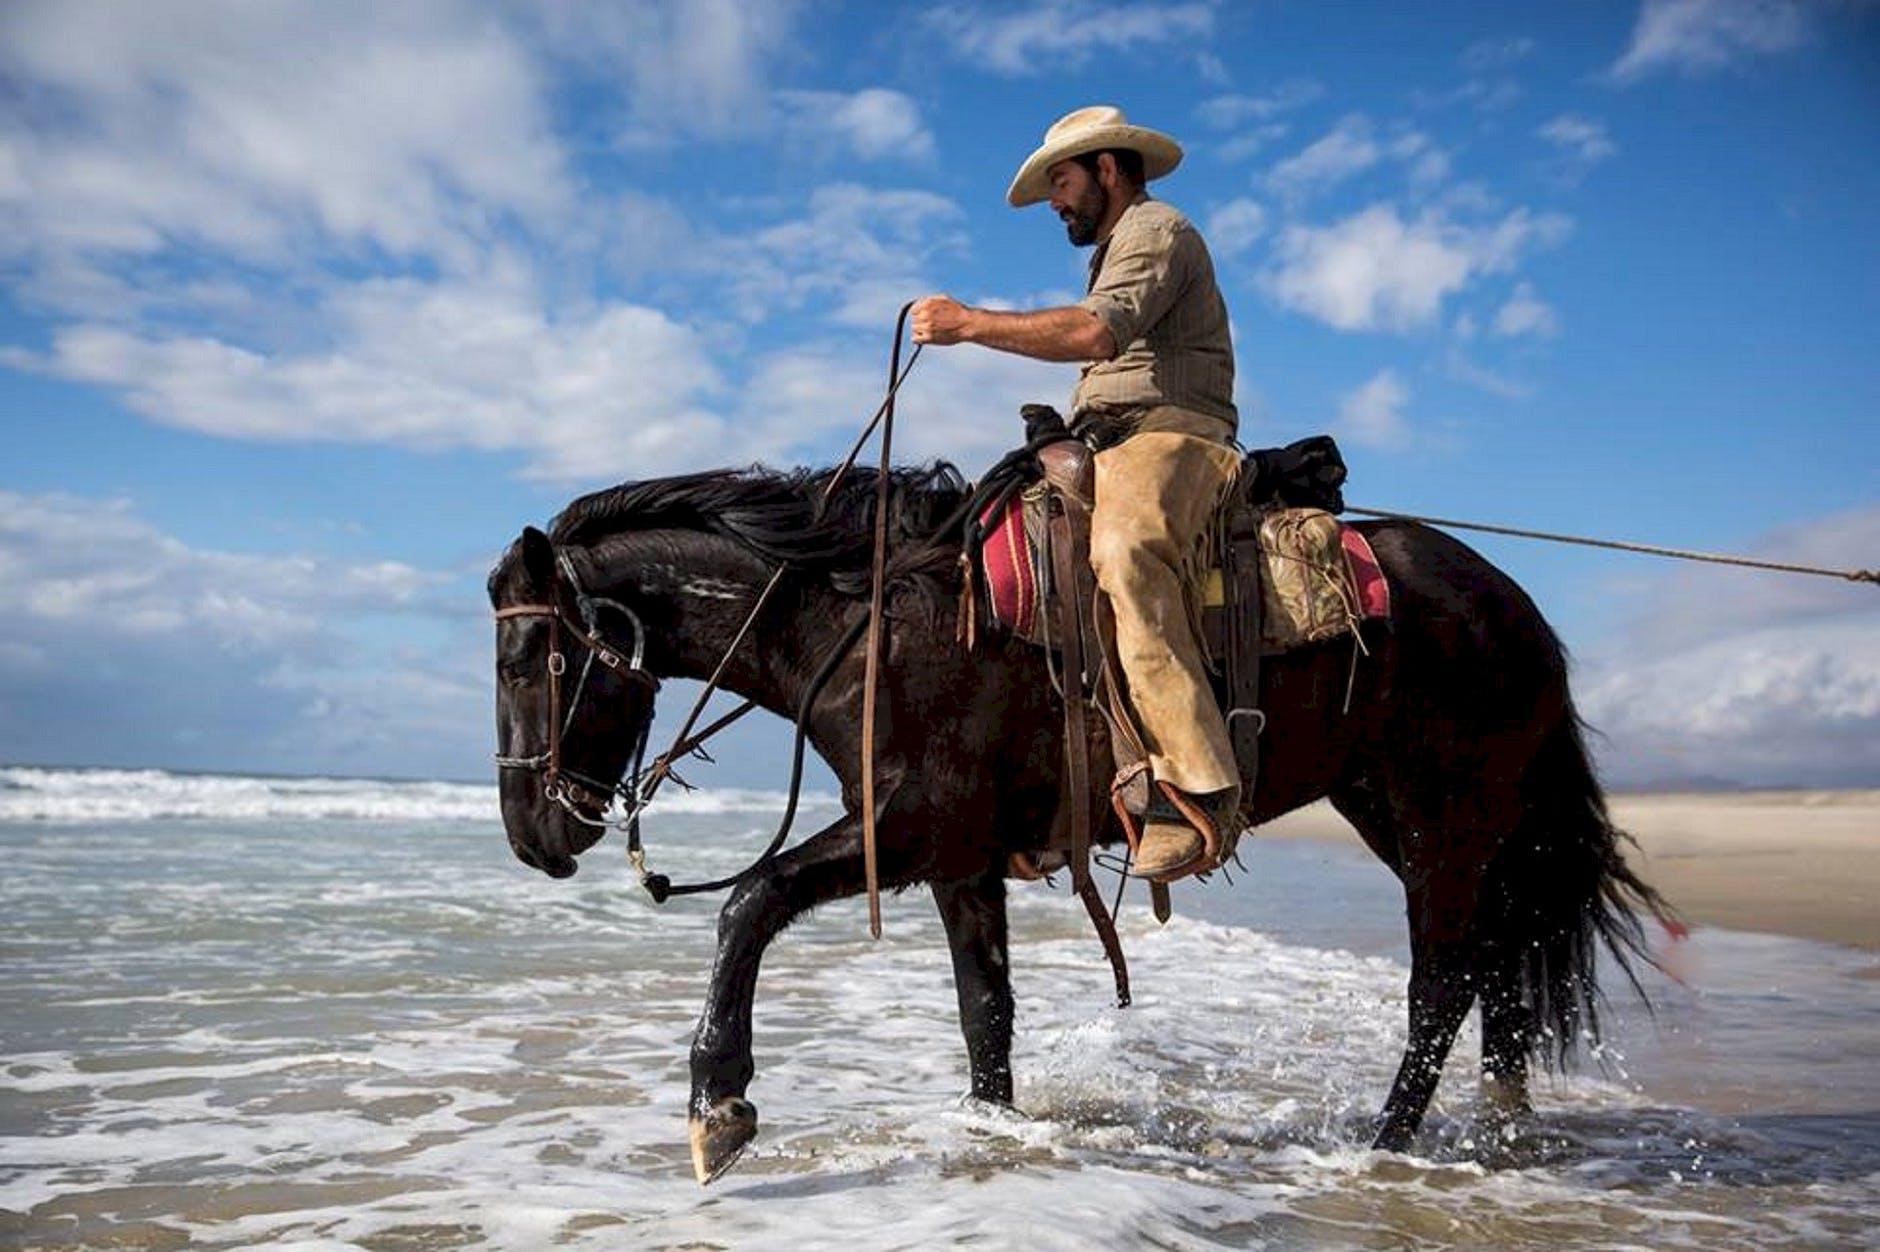 man riding horse on the beach